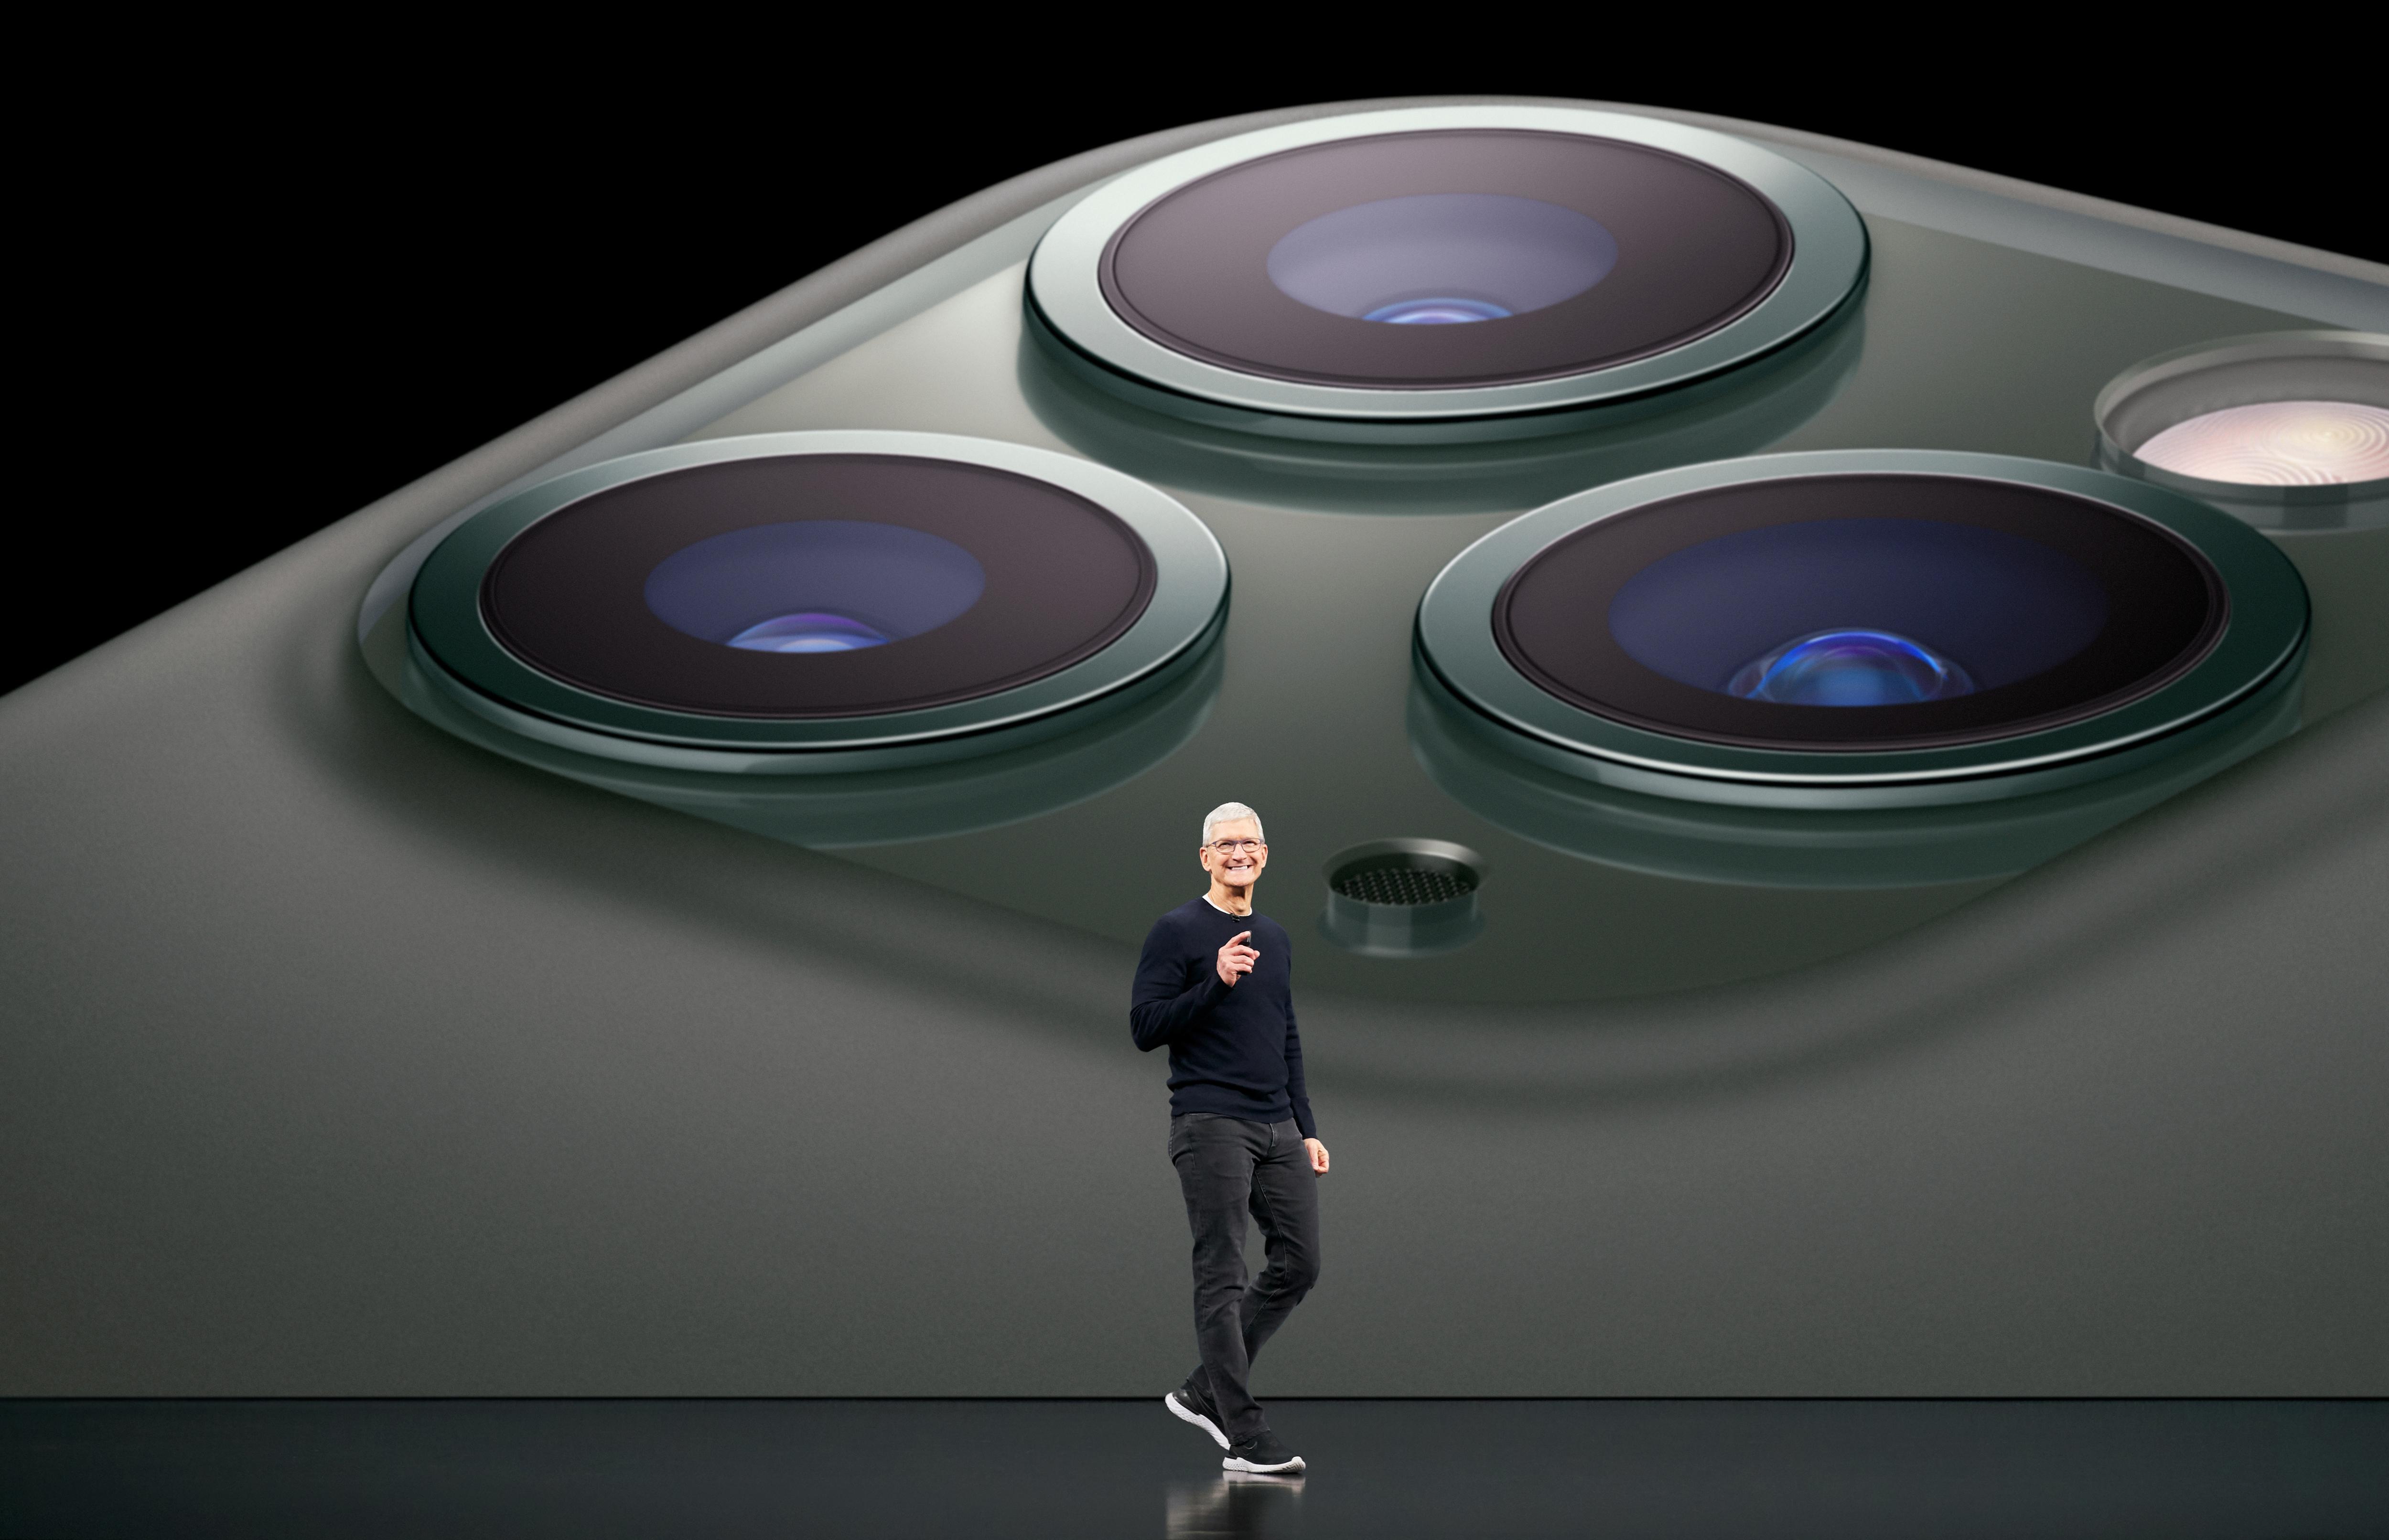 Warren Buffett's Berkshire Hathaway Unloads 3.7 Million Apple Shares   The Motley Fool